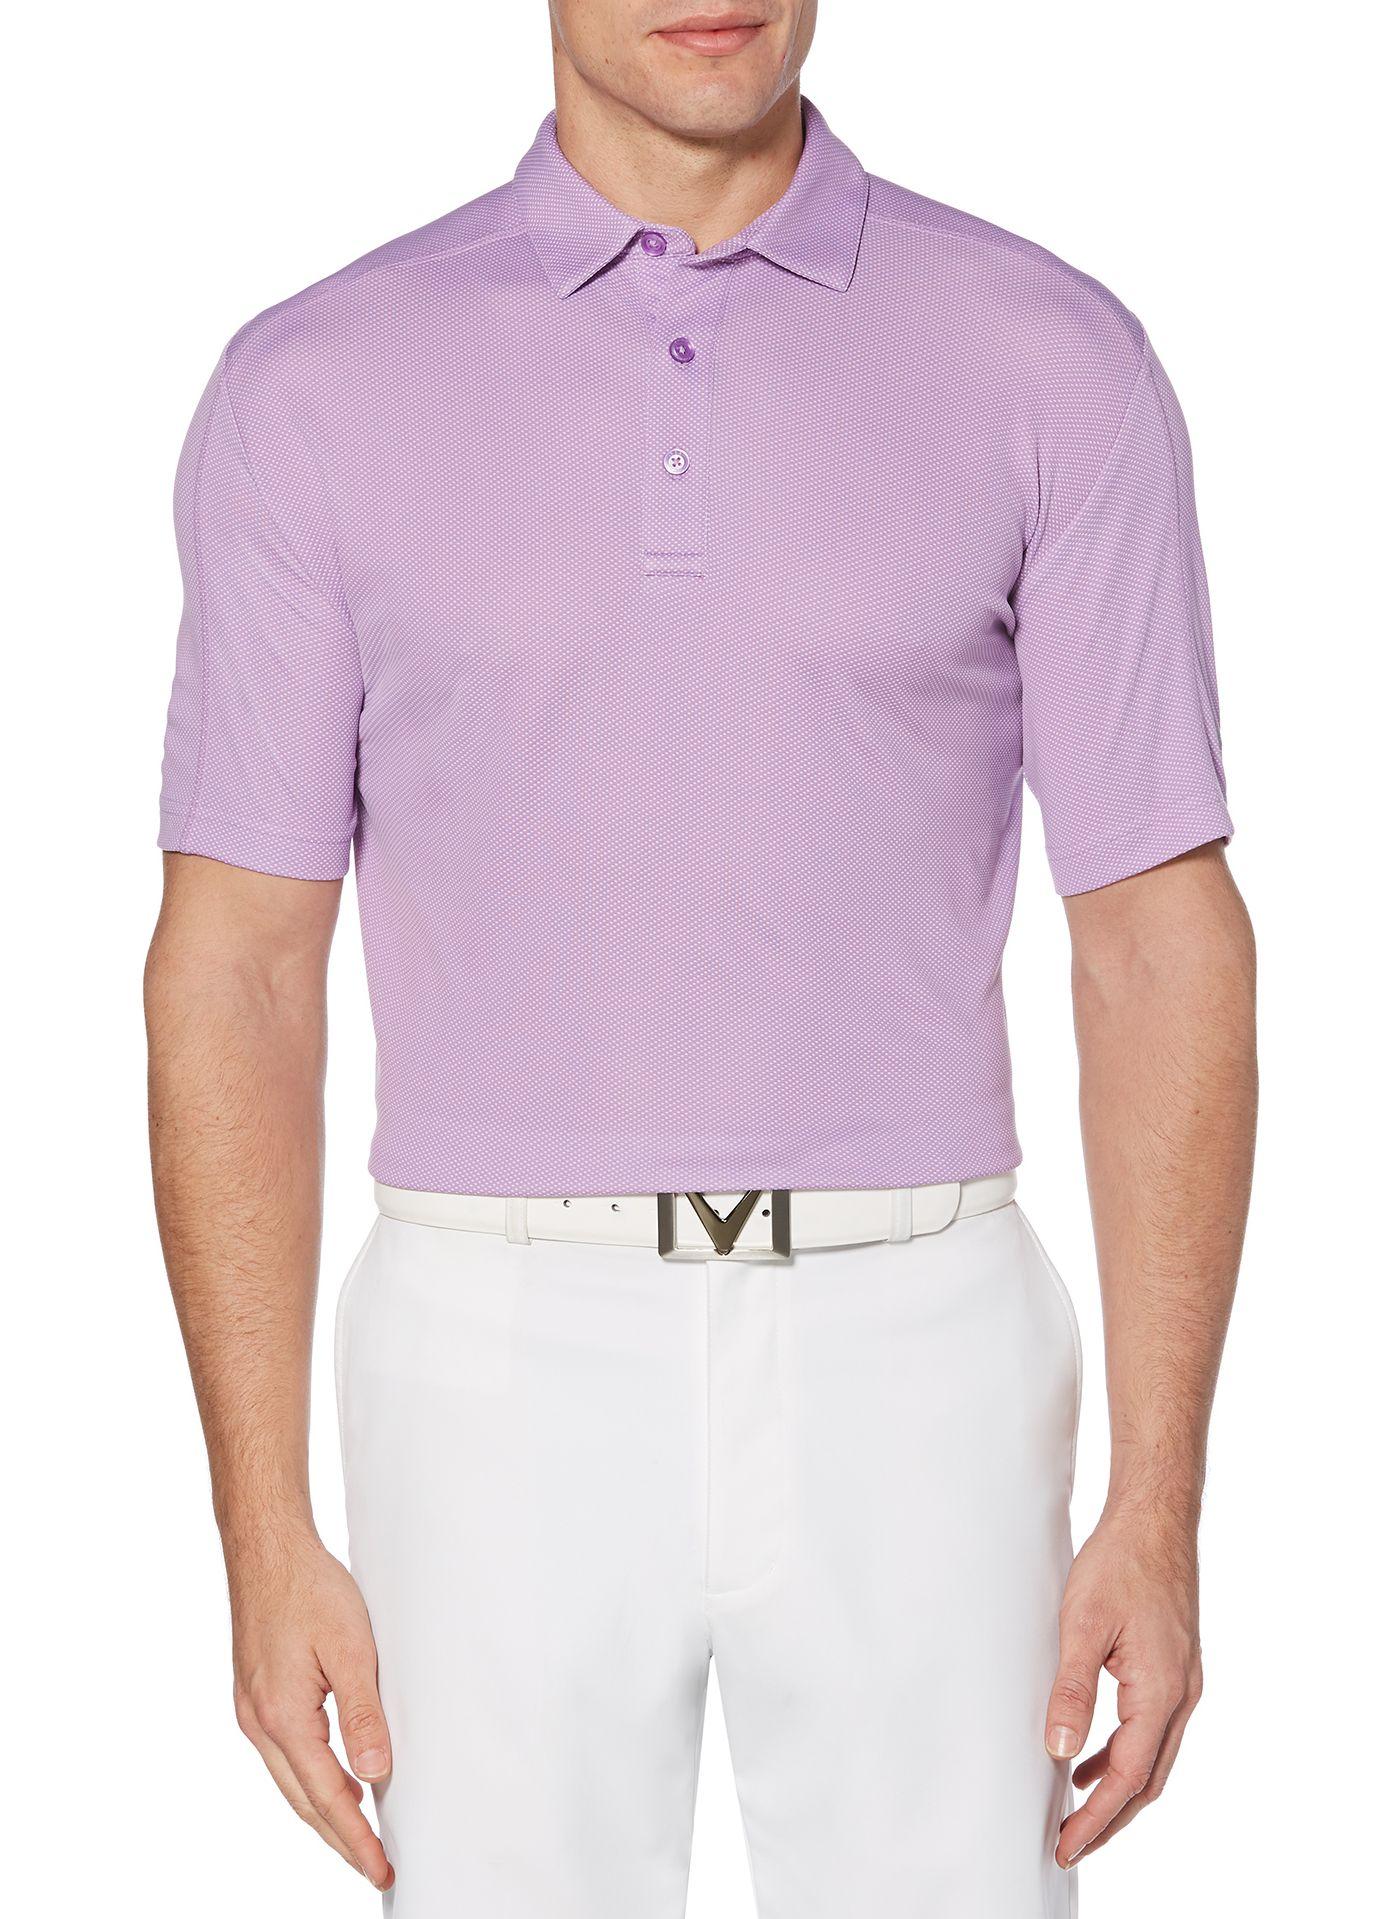 Callaway Men's Refined Jacquard Golf Polo